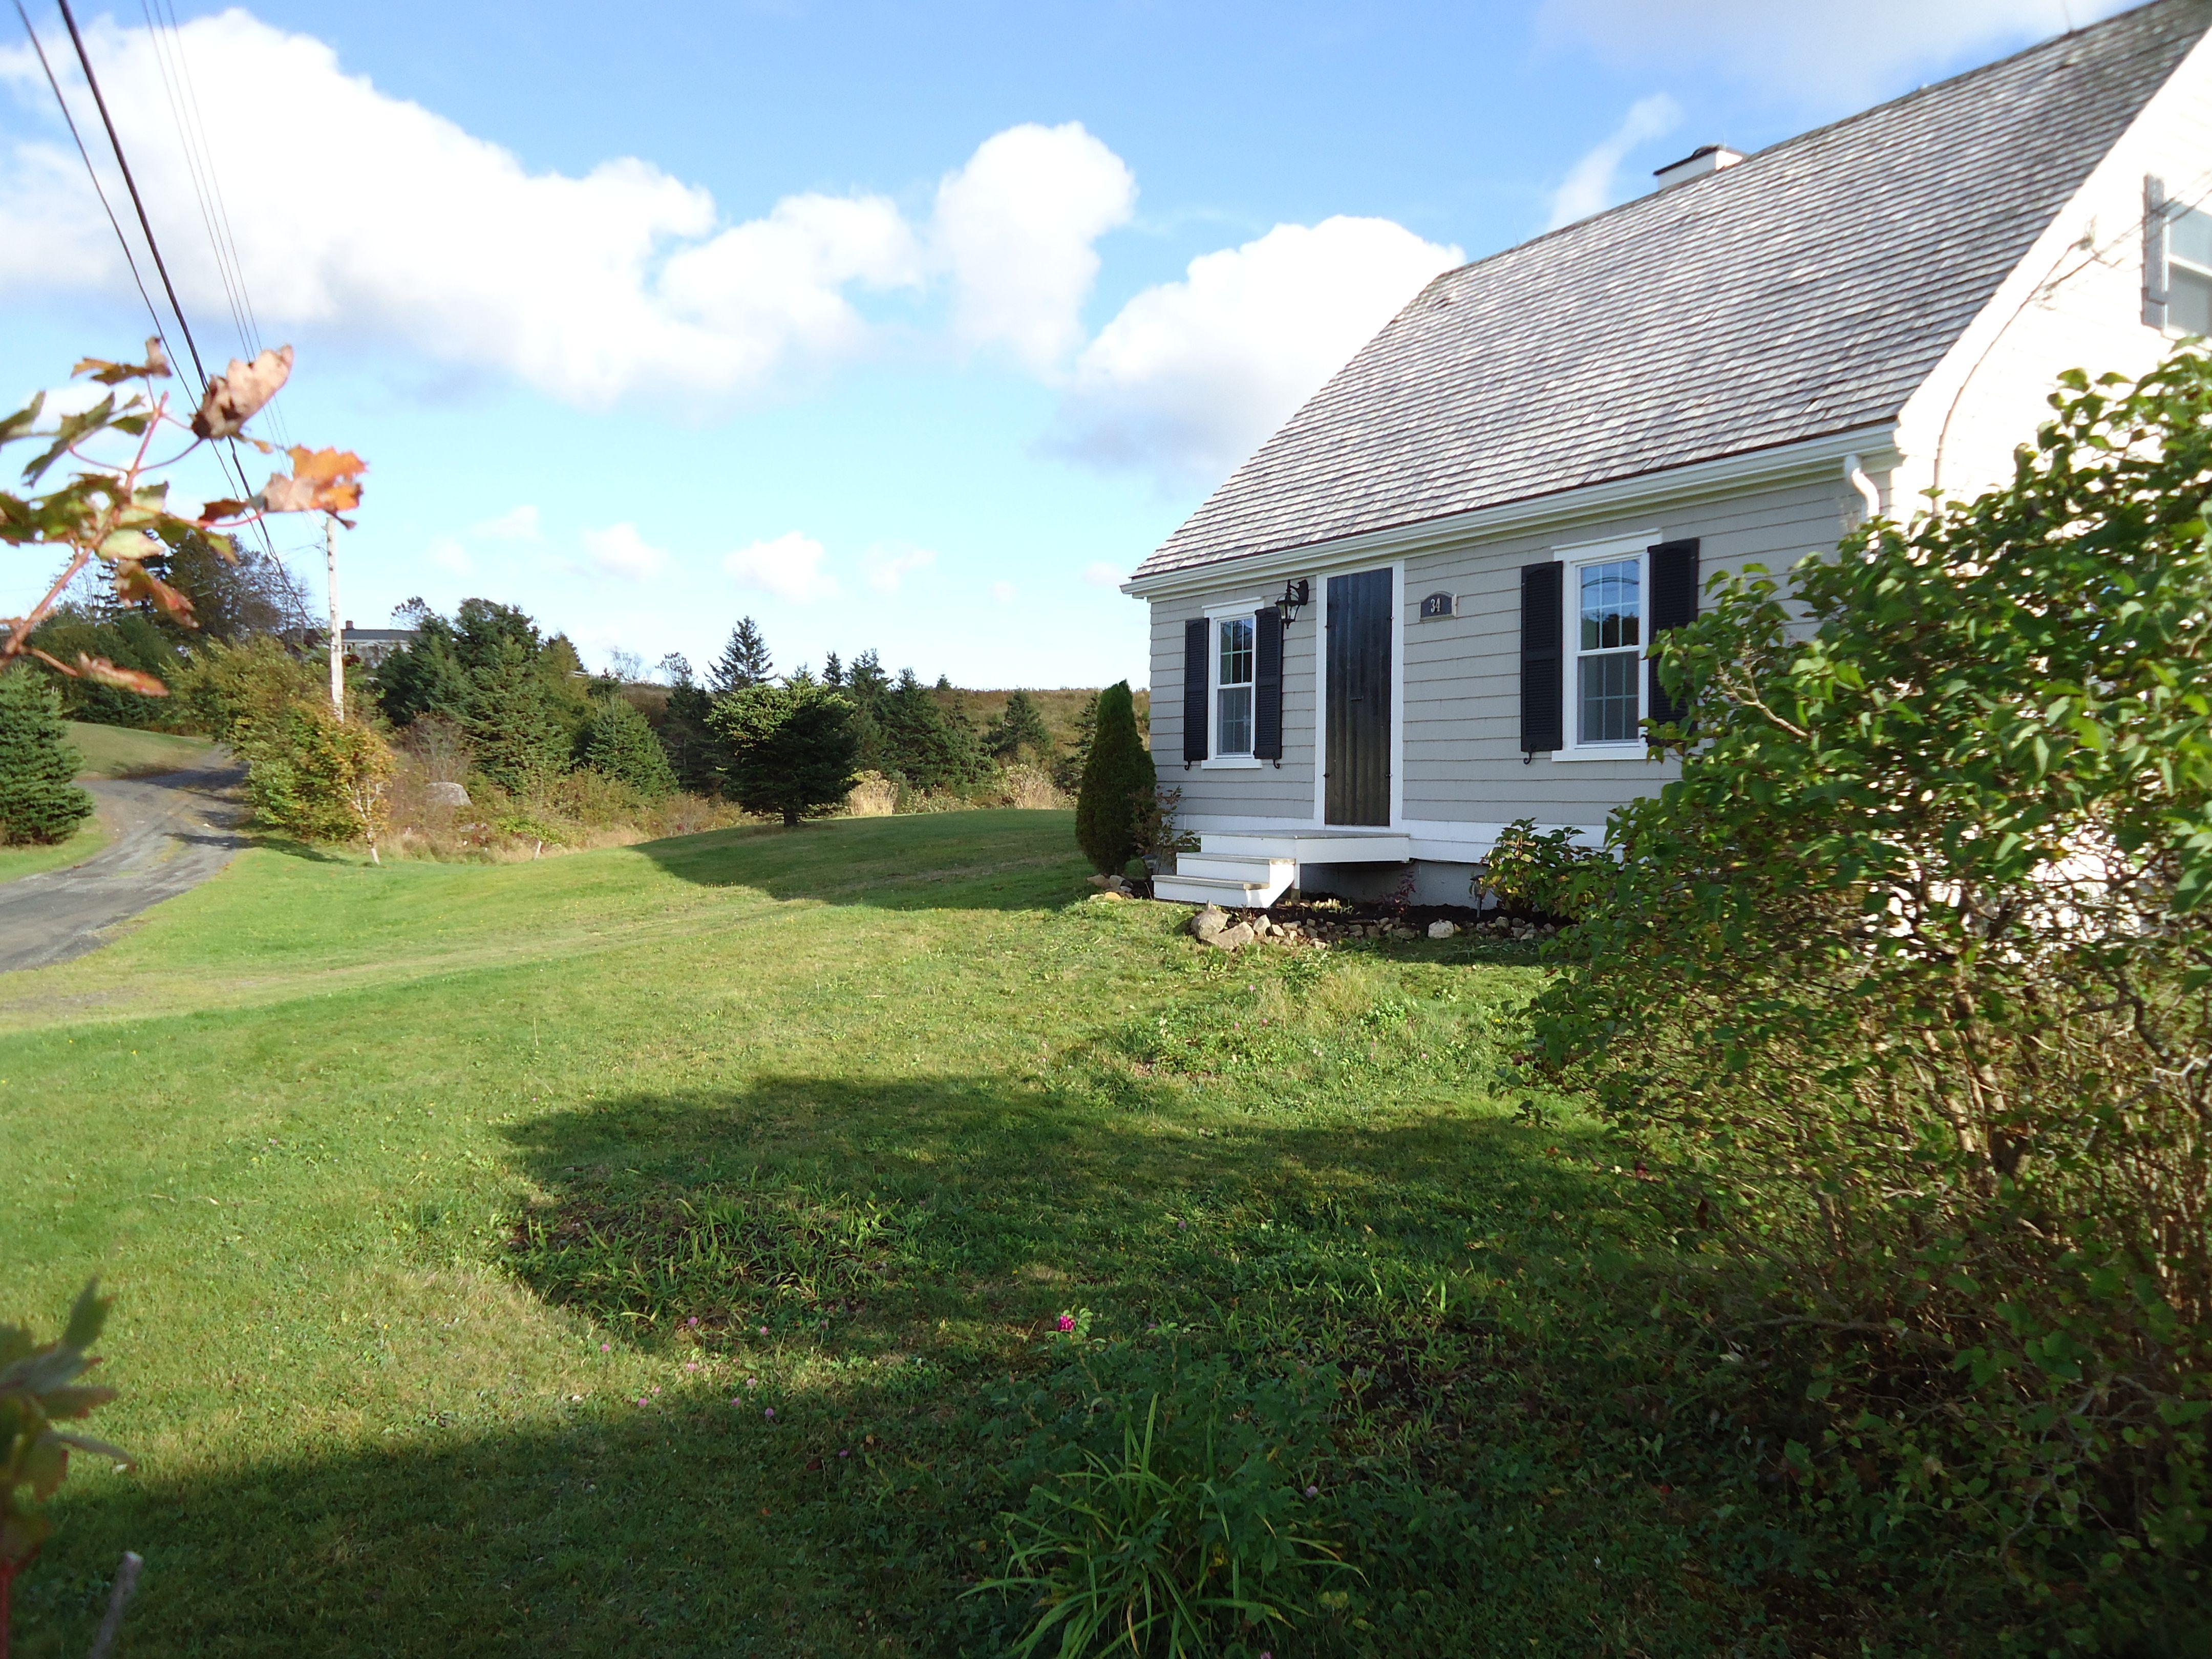 Remarkable Halifax Nova Scotia Vacation Rental Cedar Shingled 1800S Home Interior And Landscaping Ymoonbapapsignezvosmurscom